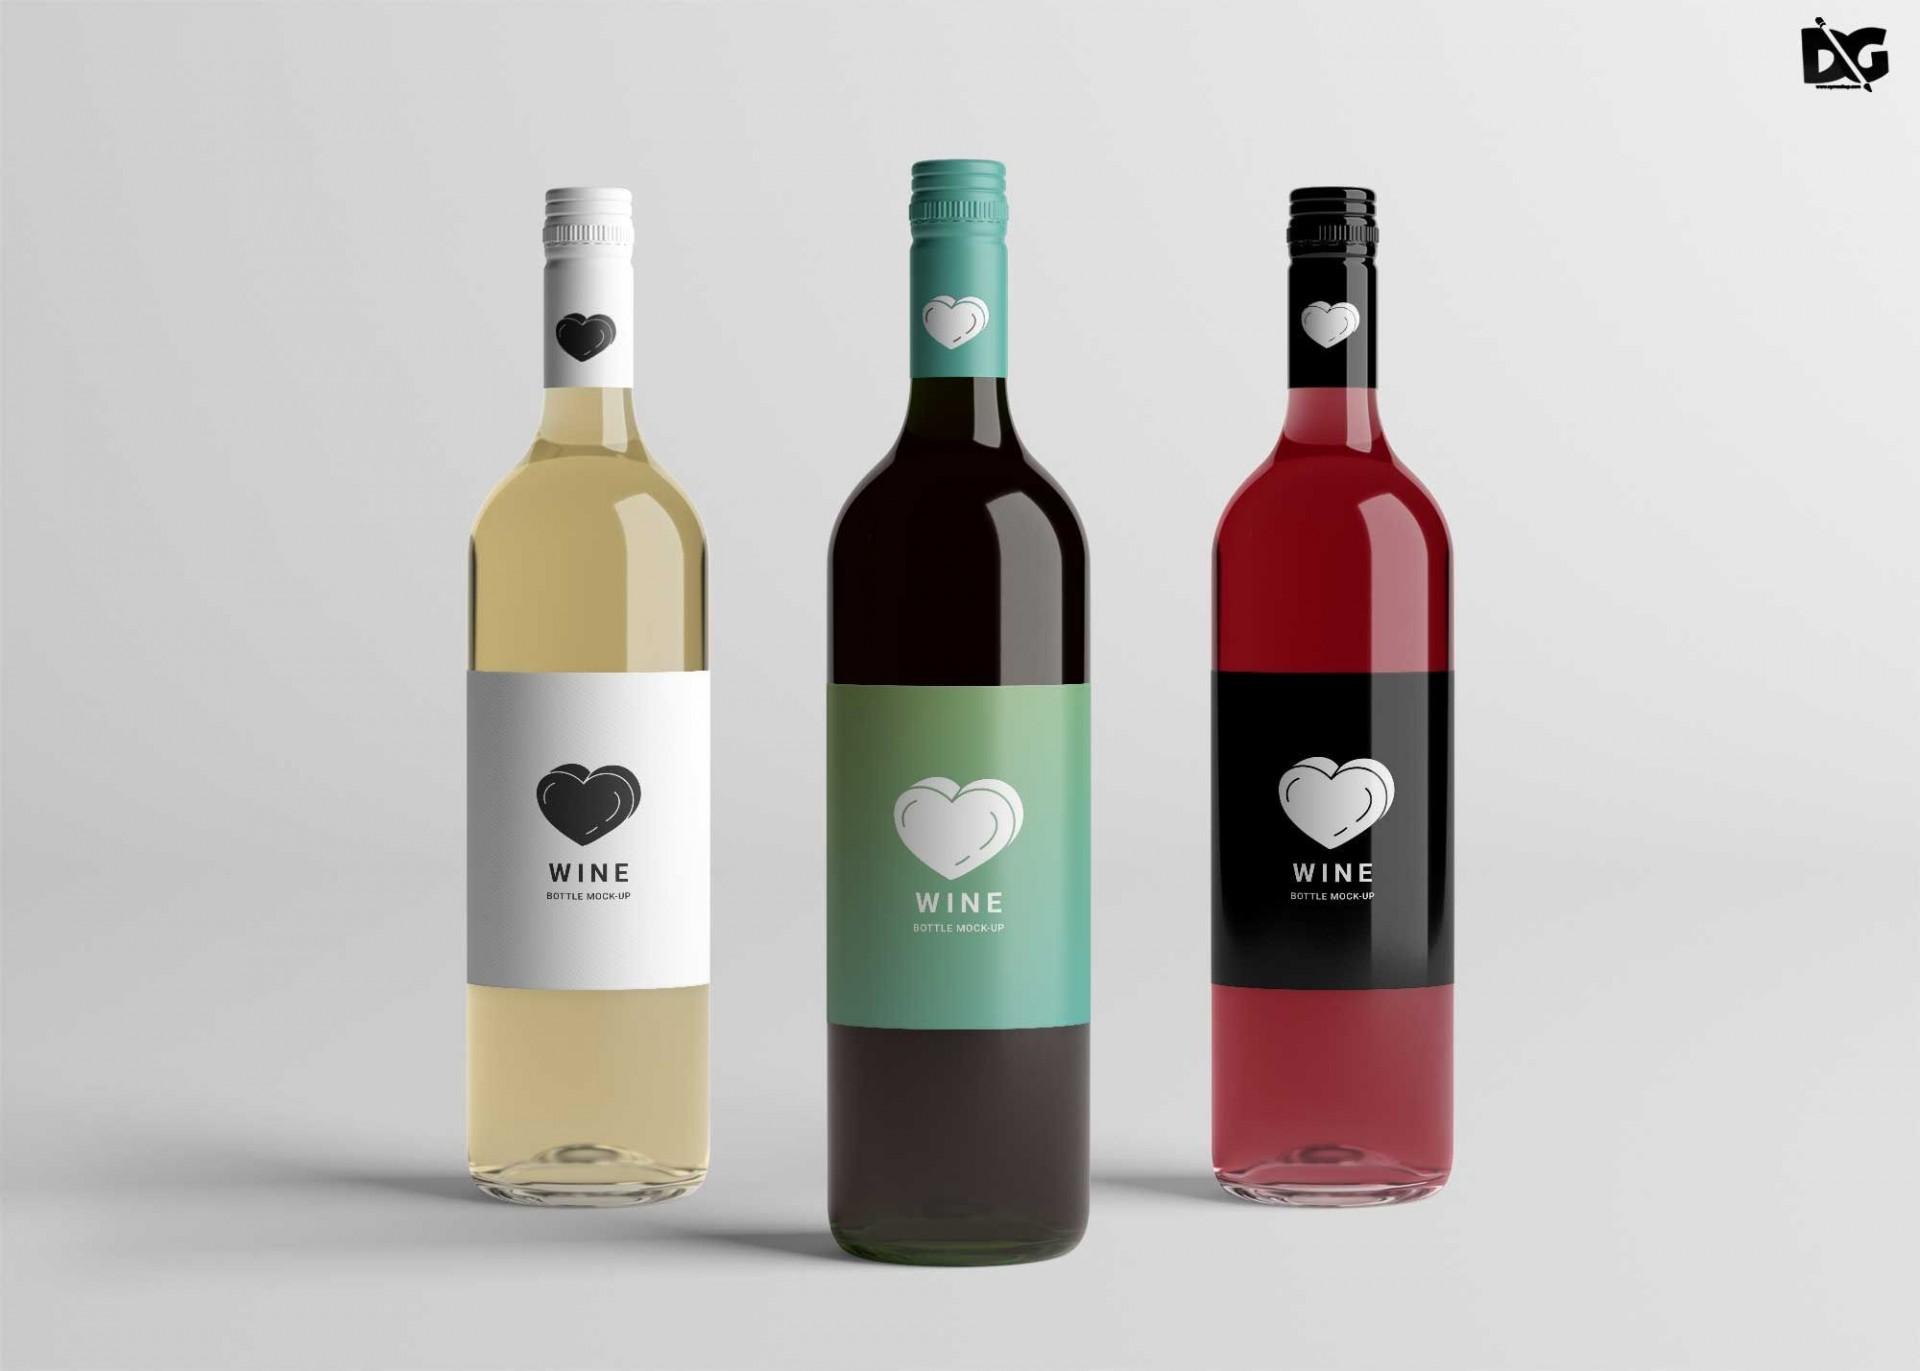 002 Surprising Free Wine Bottle Label Template Highest Clarity  Mini Printable1920